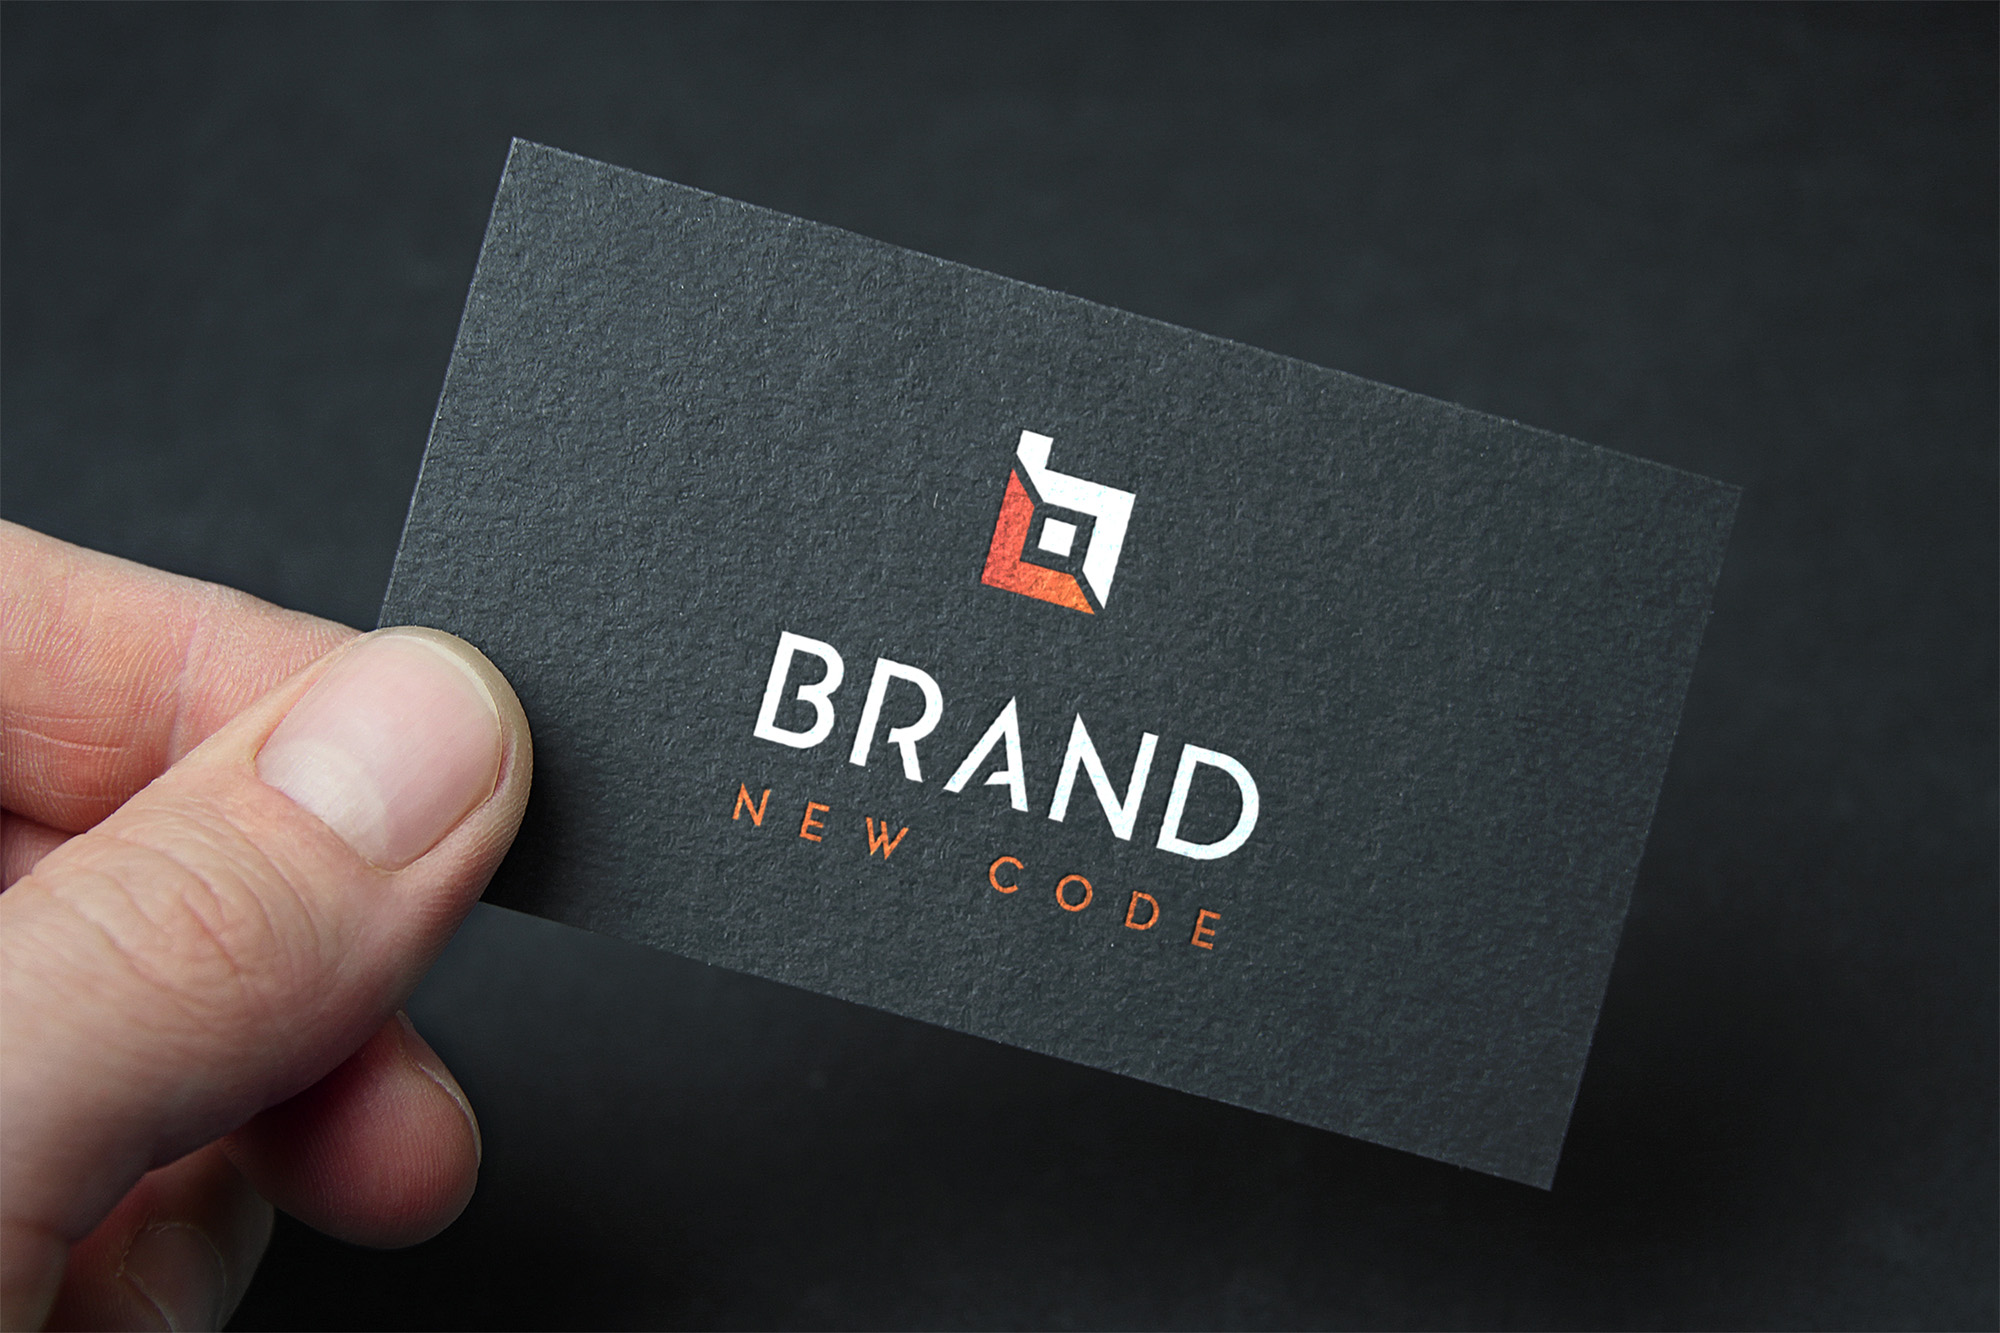 brand_new_code_logo_2